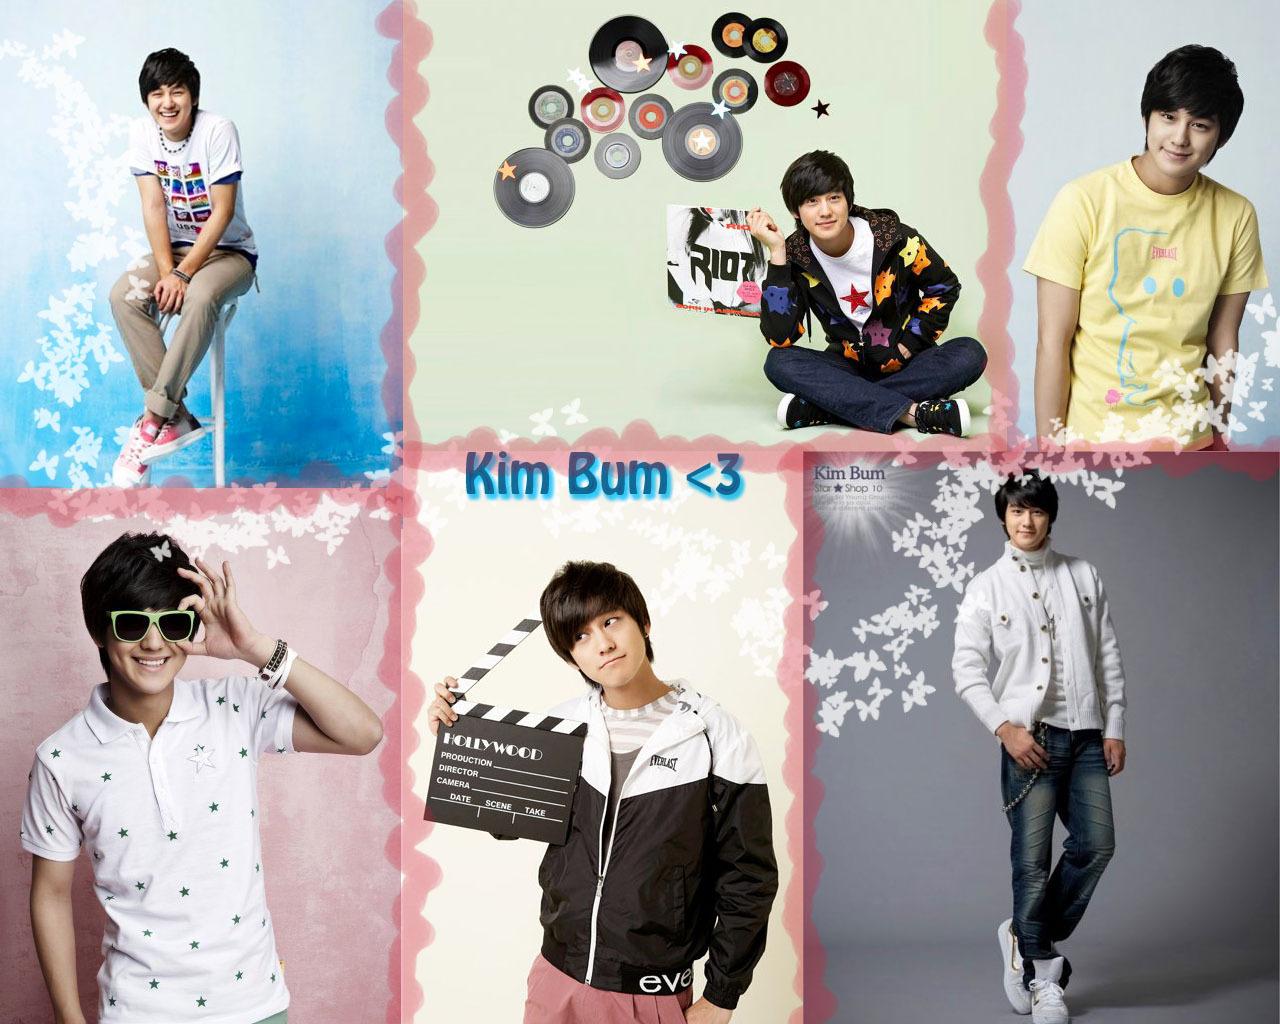 http://2.bp.blogspot.com/_aLgAd3JGJj8/TL75FF5pqsI/AAAAAAAAAag/zCoxUAK5dE0/s1600/wallpaper+kim+bum.jpg